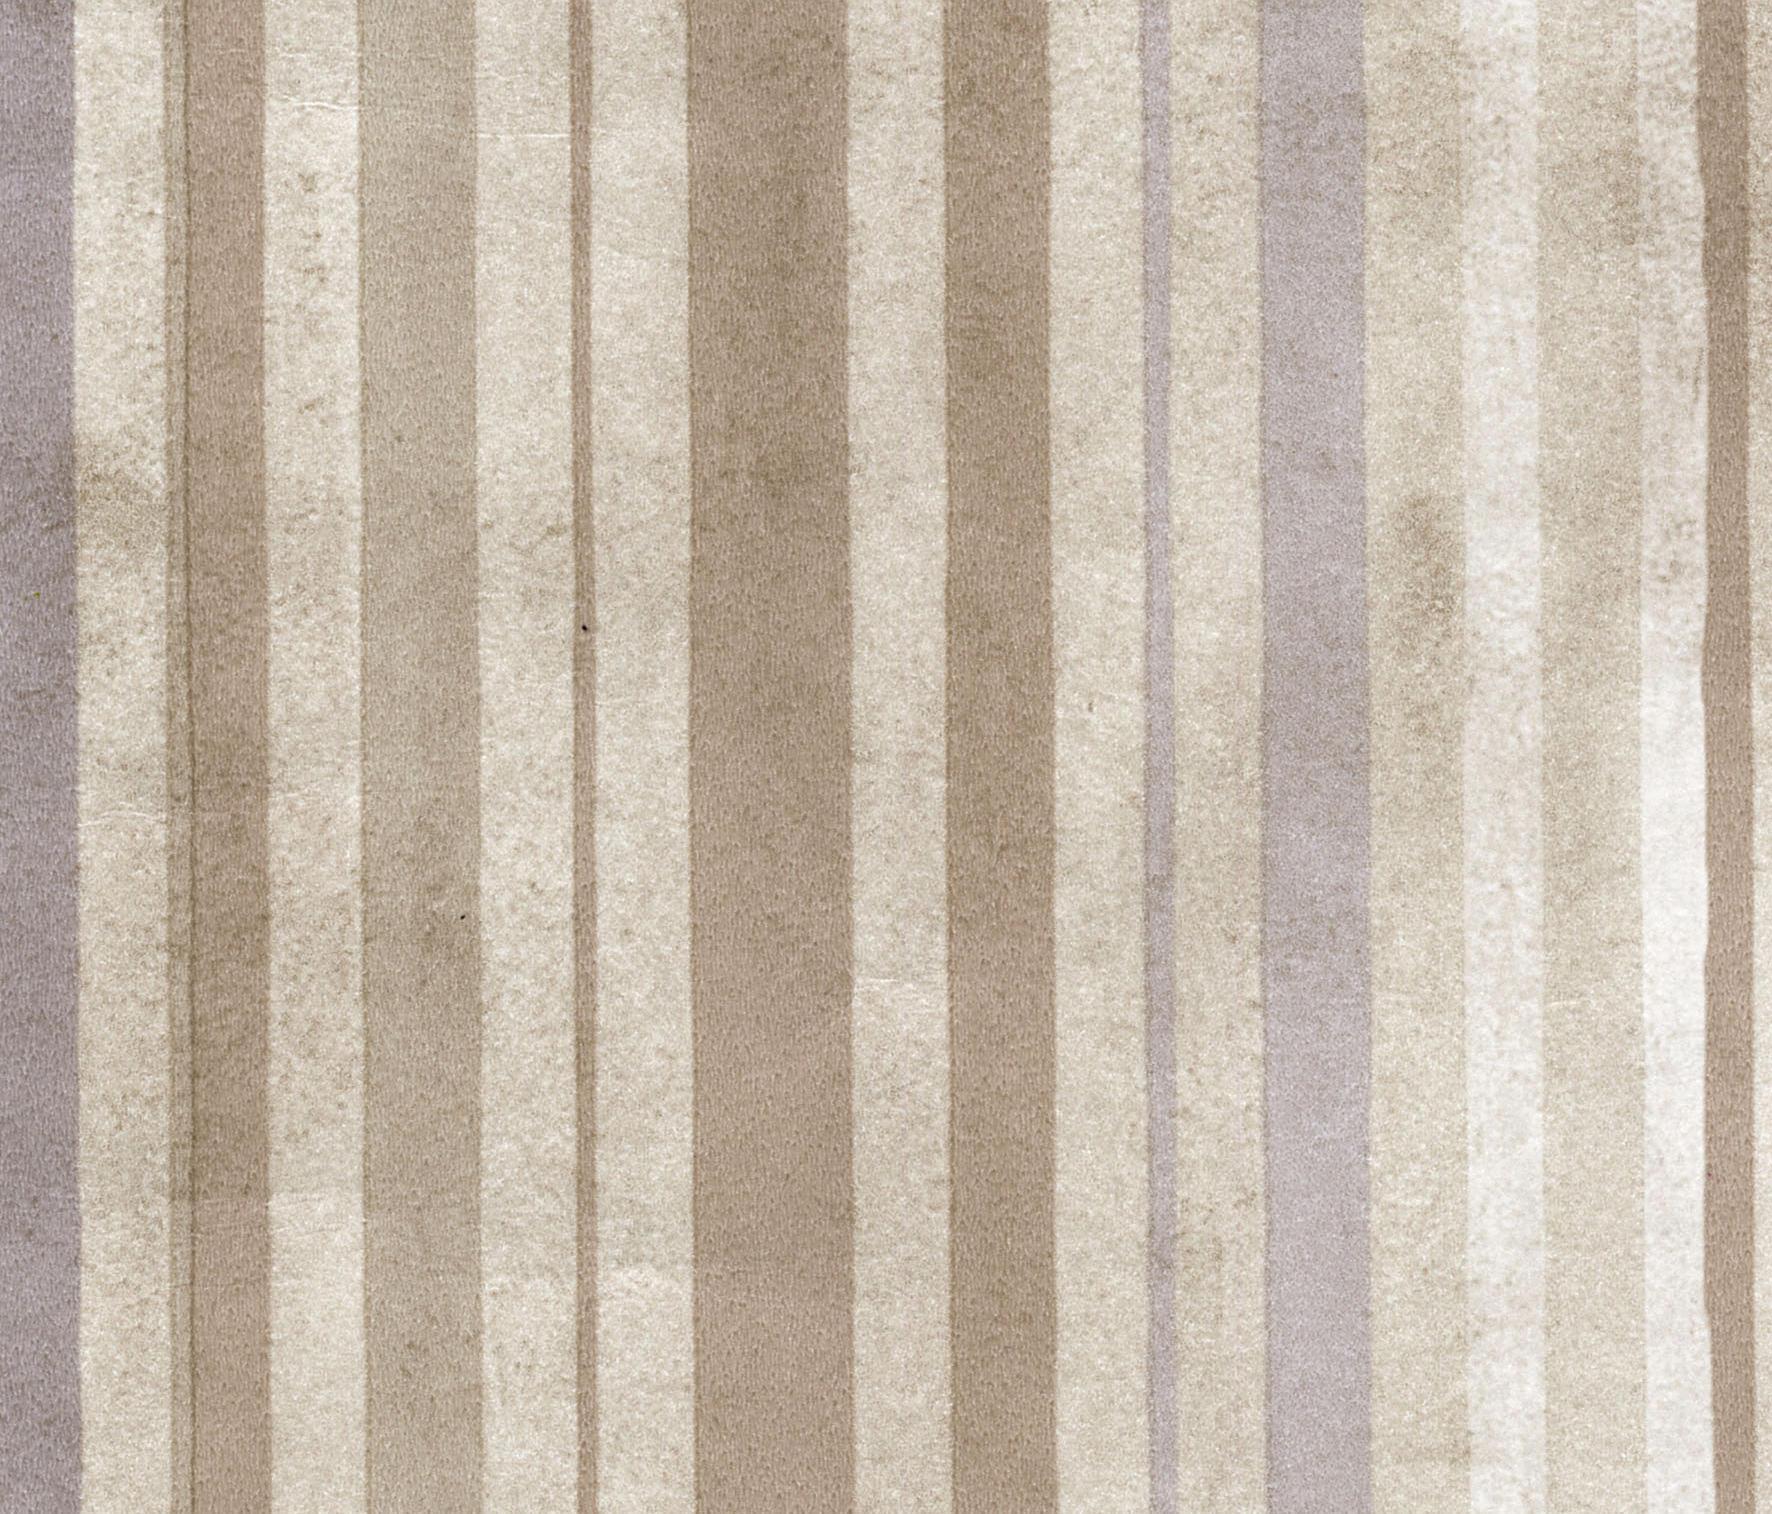 Carta Da Parati Elitis.Tempo Cucaracha Tp 240 01 Wall Coverings Wallpapers From